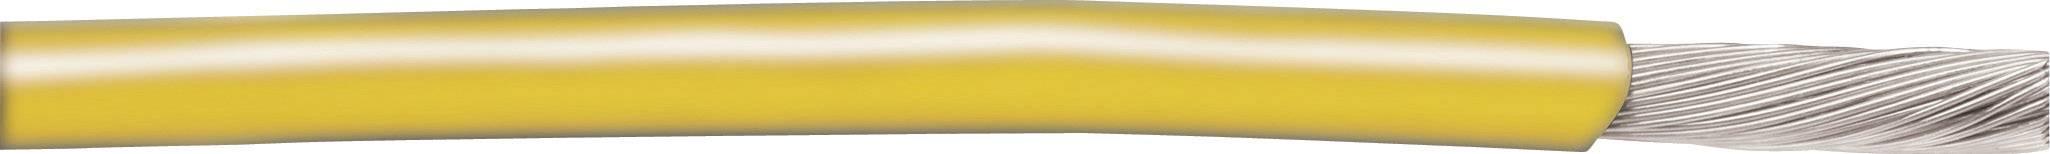 Pletenica EcoWire 1 x 5.26 mm, rumena AlphaWire 6719 30.5 m